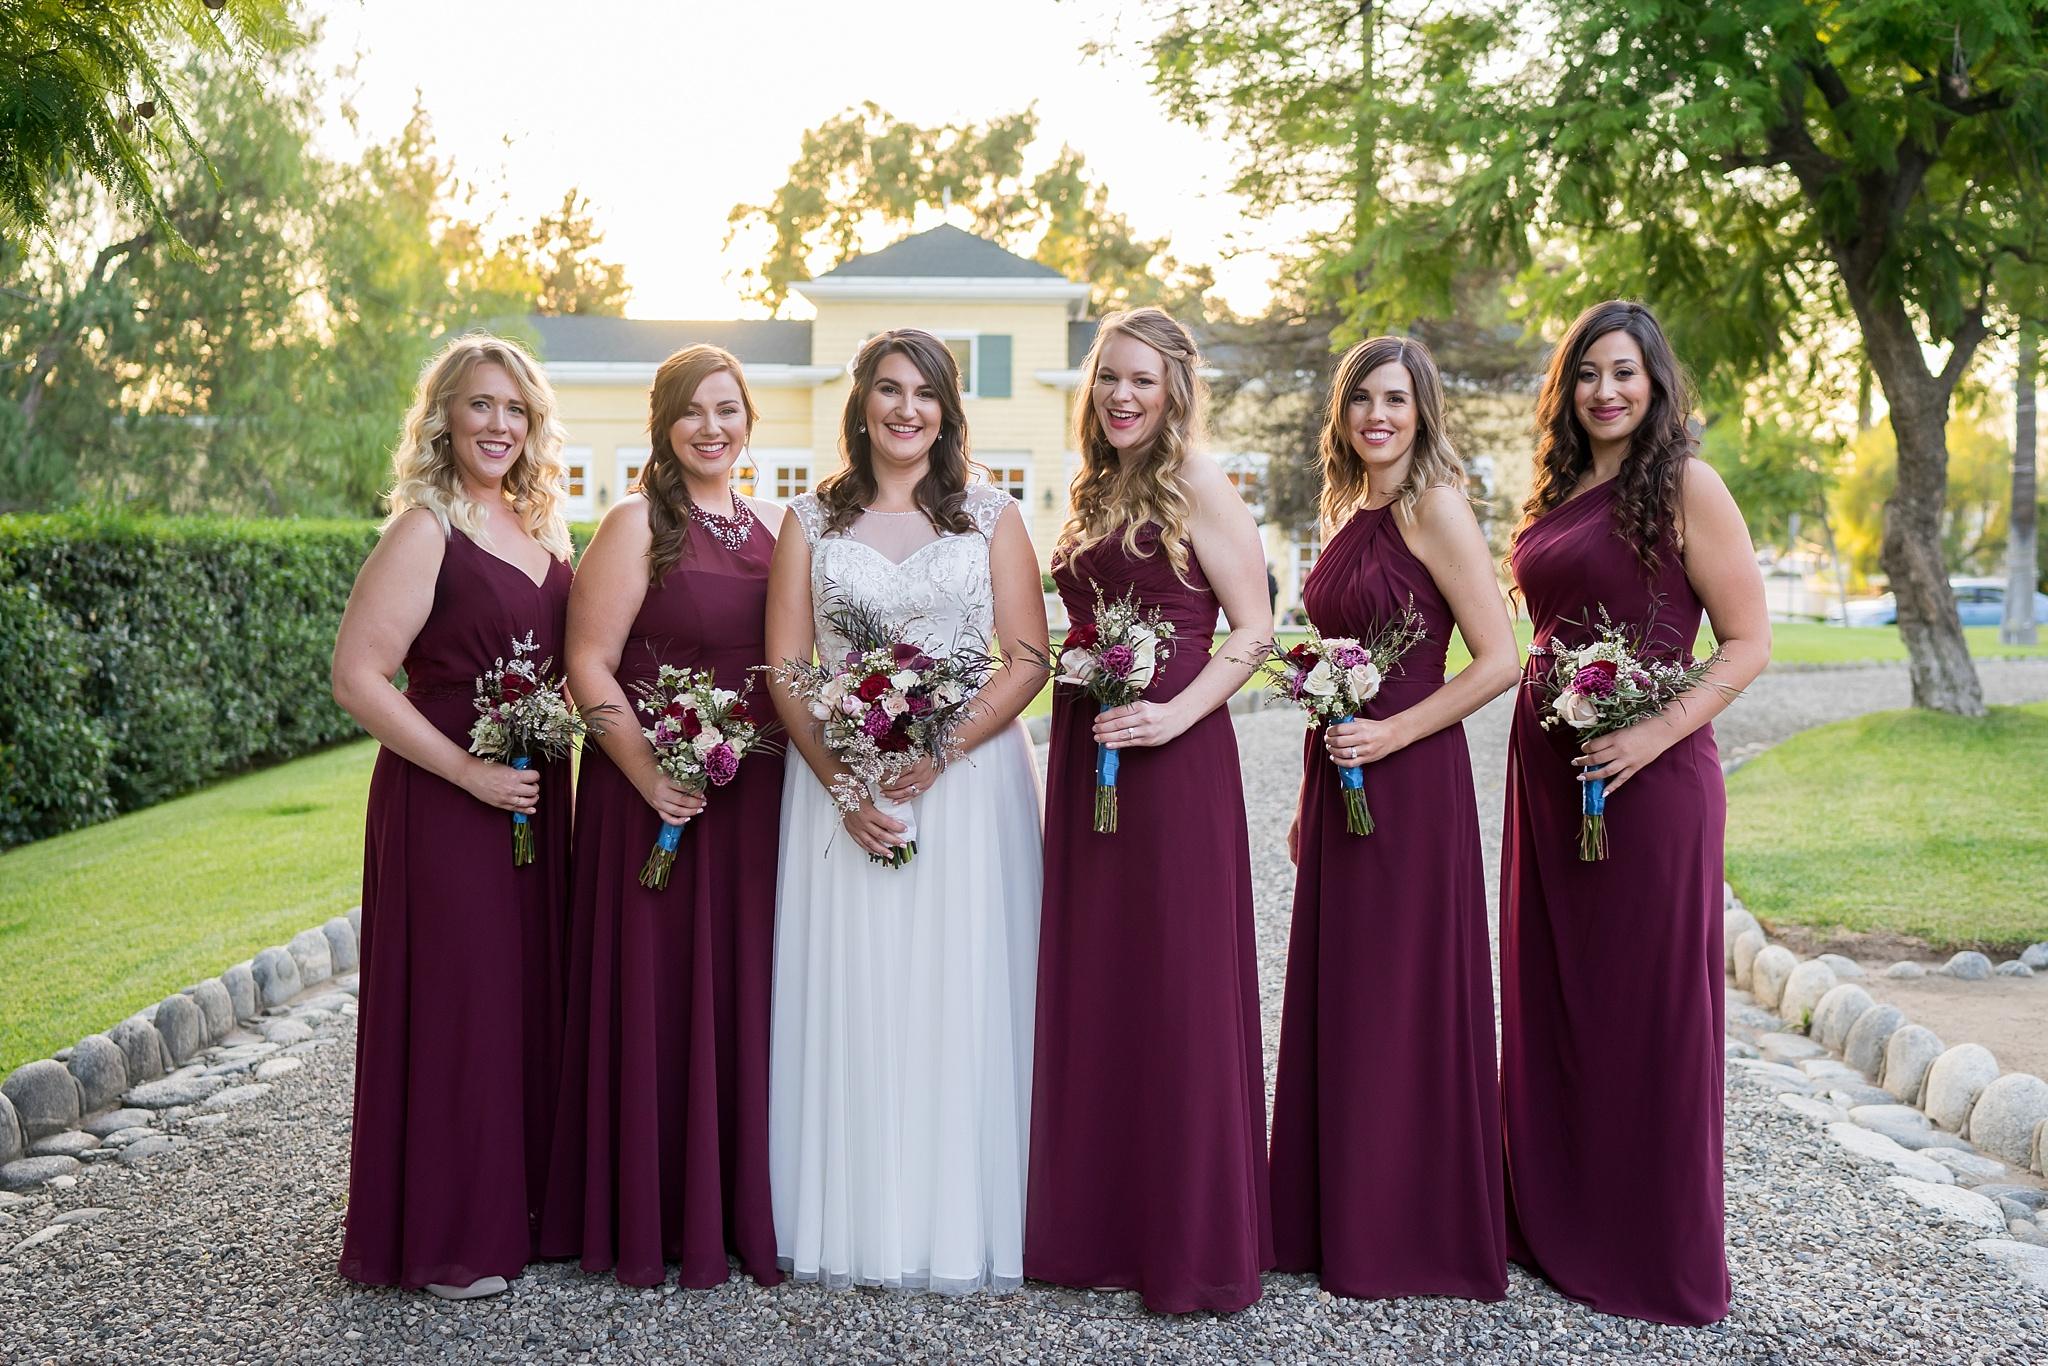 TommyandAmanda_WEDDING_BrienneMichelle_WeddingParty_19_BLOG.jpg